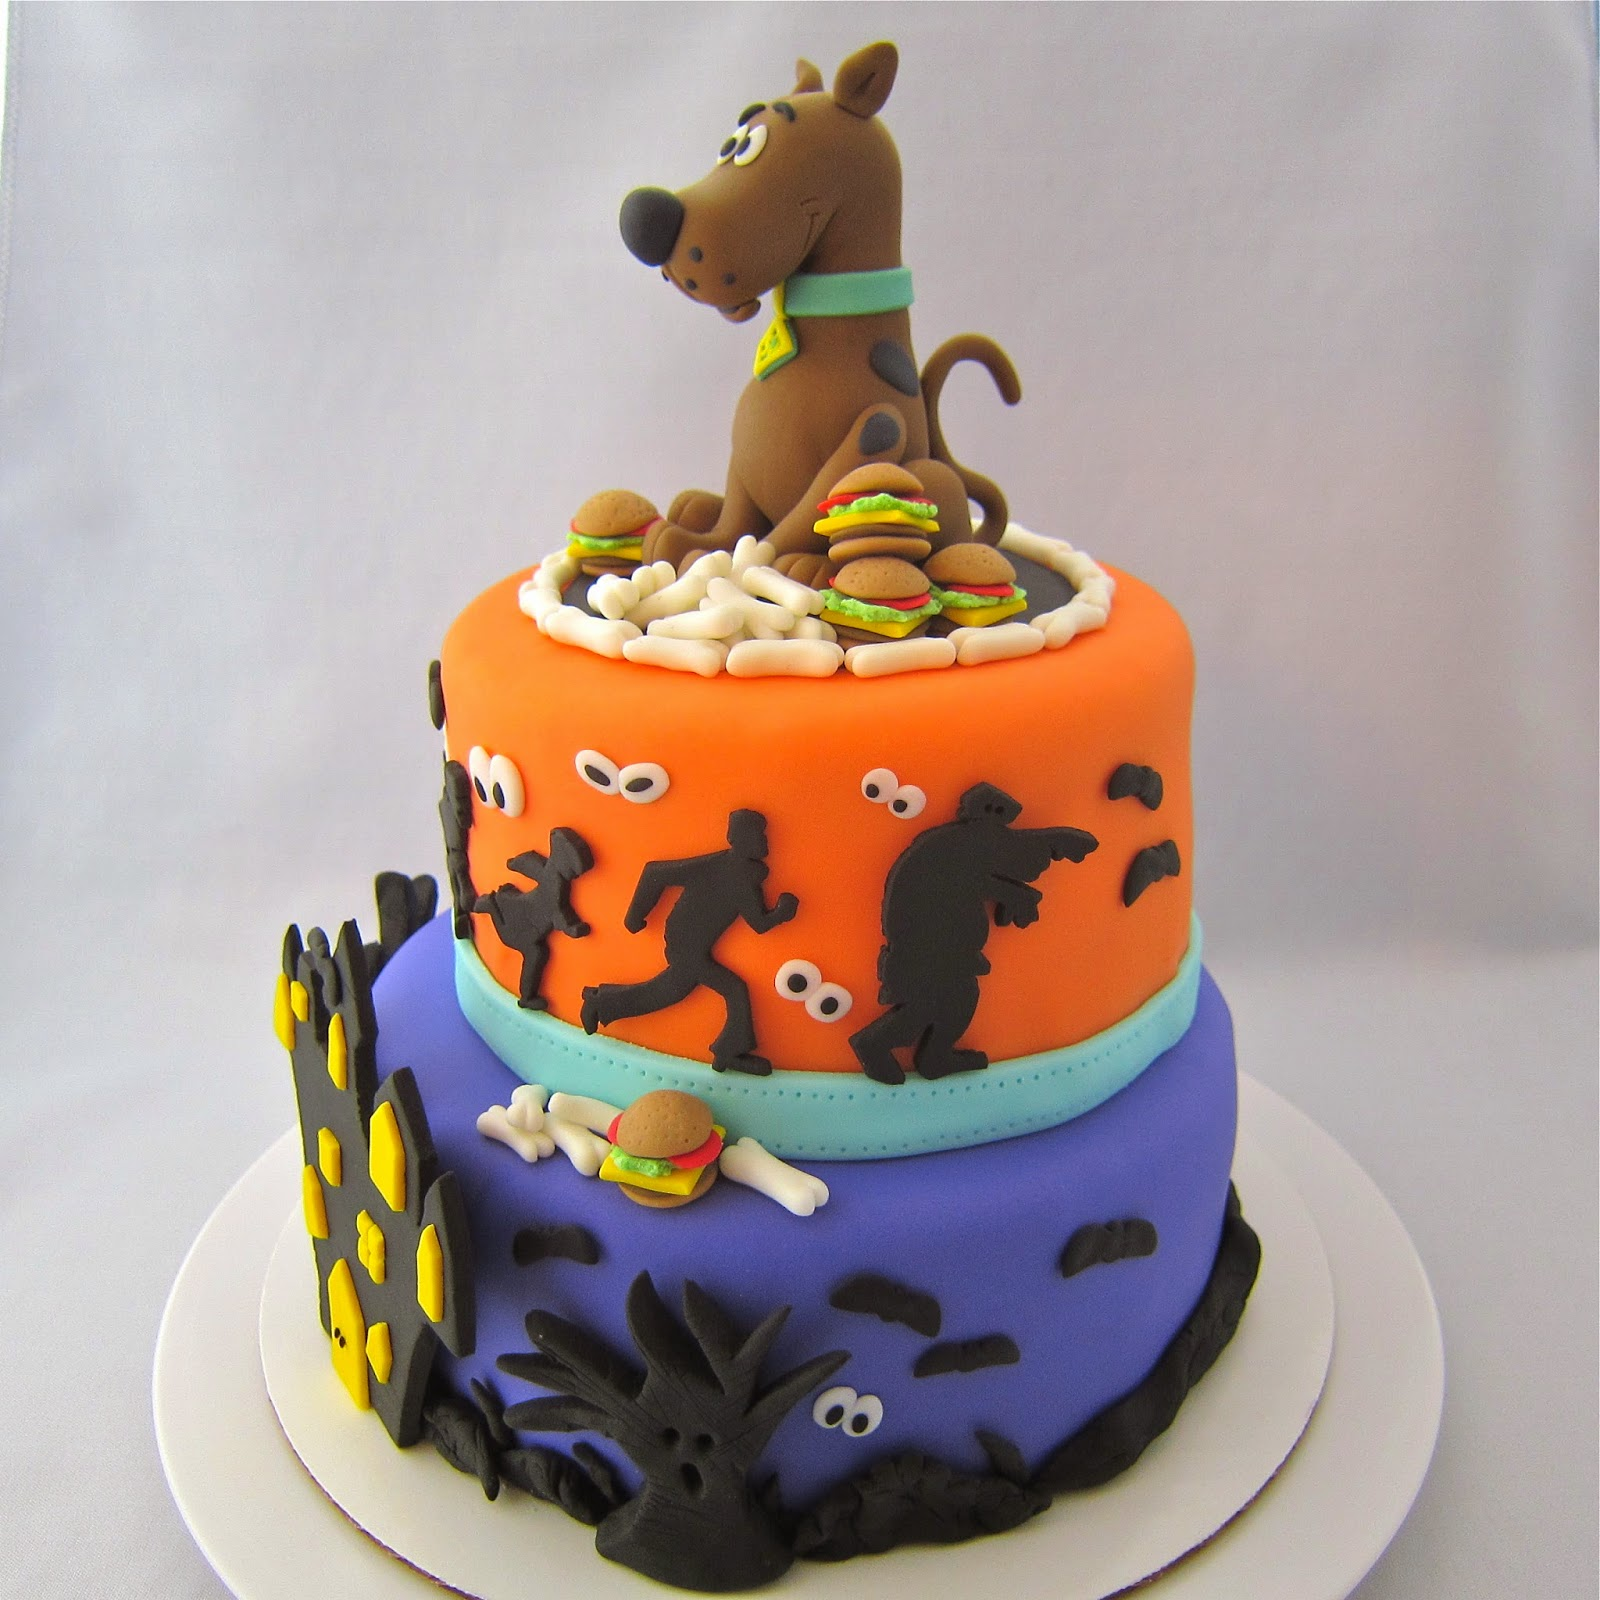 Scooby Birthday Cake Ideas